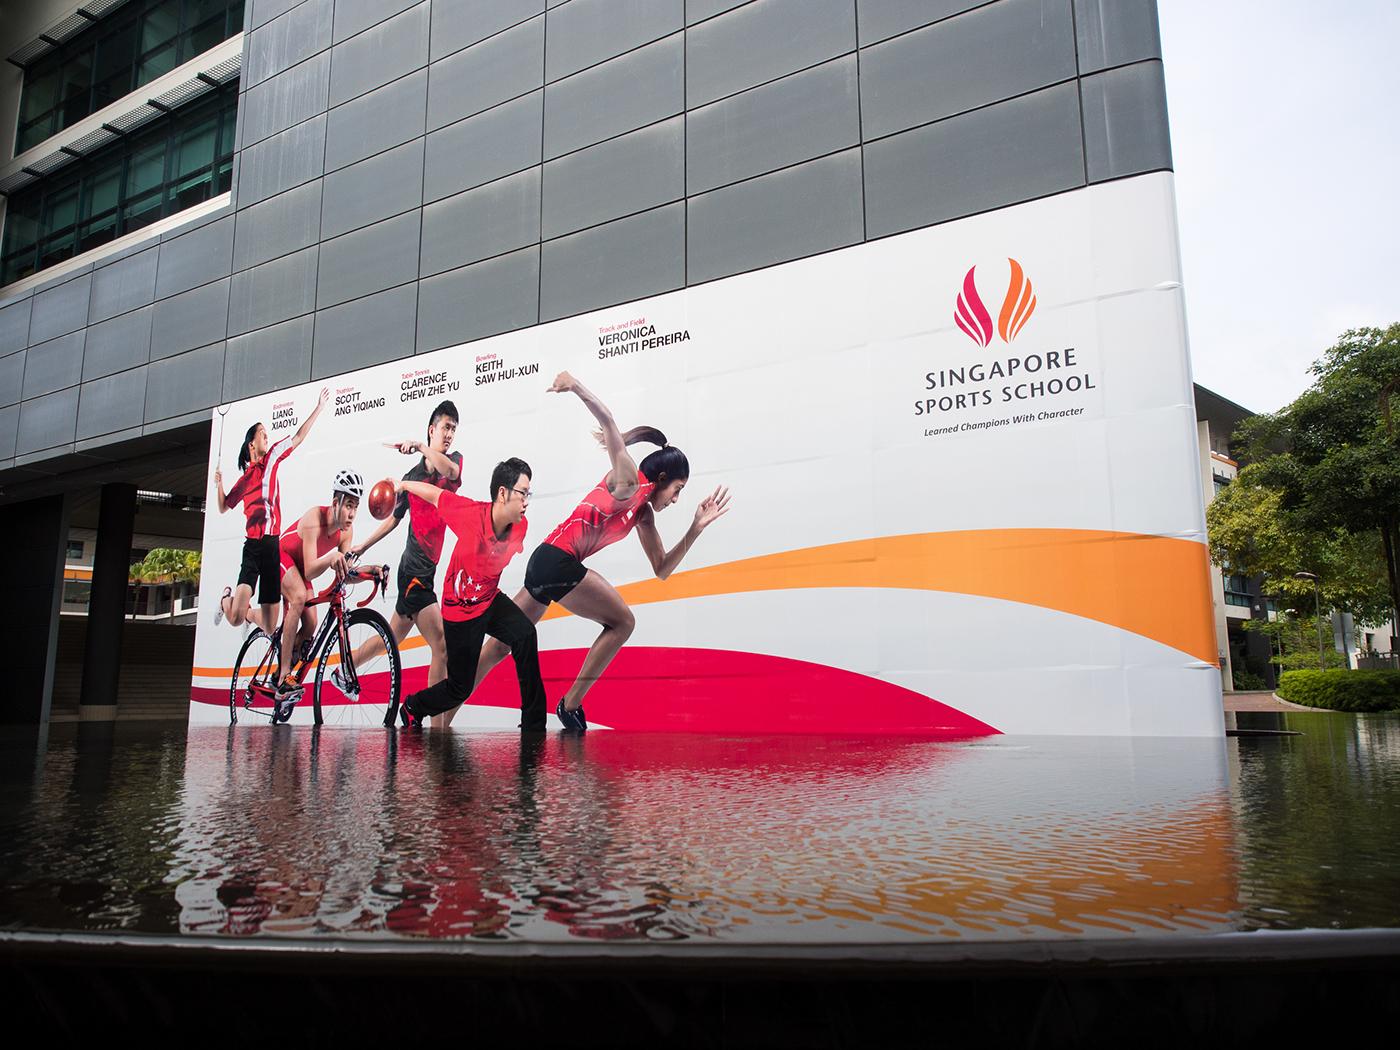 singapore Sports School athletes billboard Spatial Design environmental design